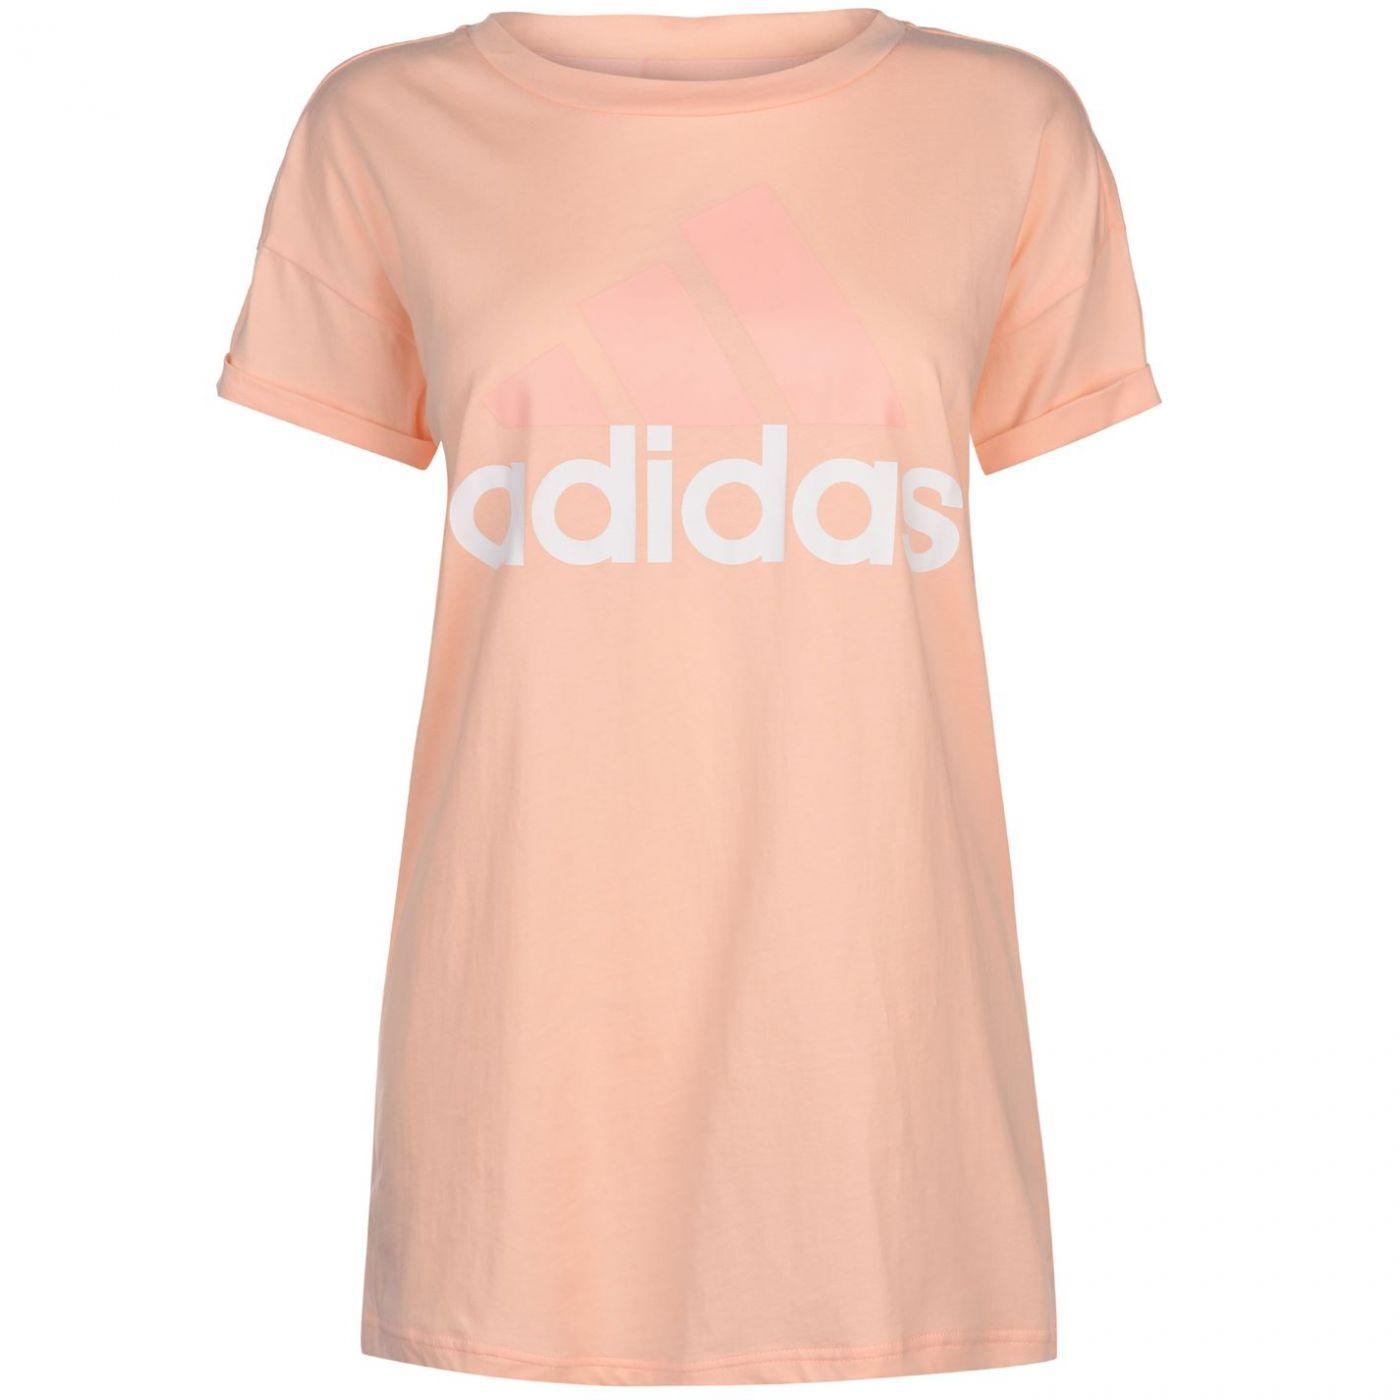 Adidas Boyfriend T Shirt Ladies